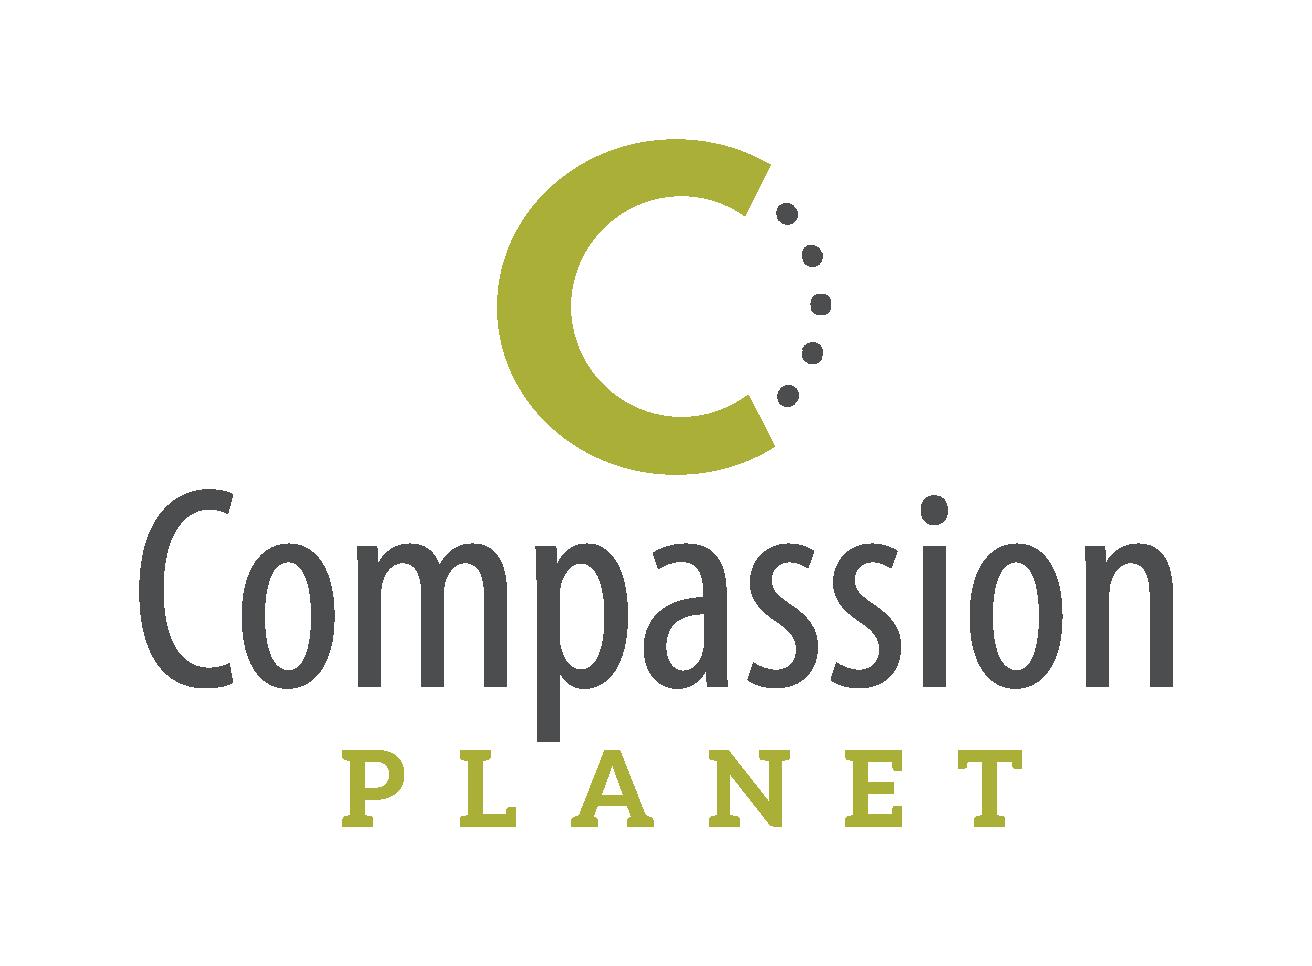 WIST - Compassion Planet Fundraiser